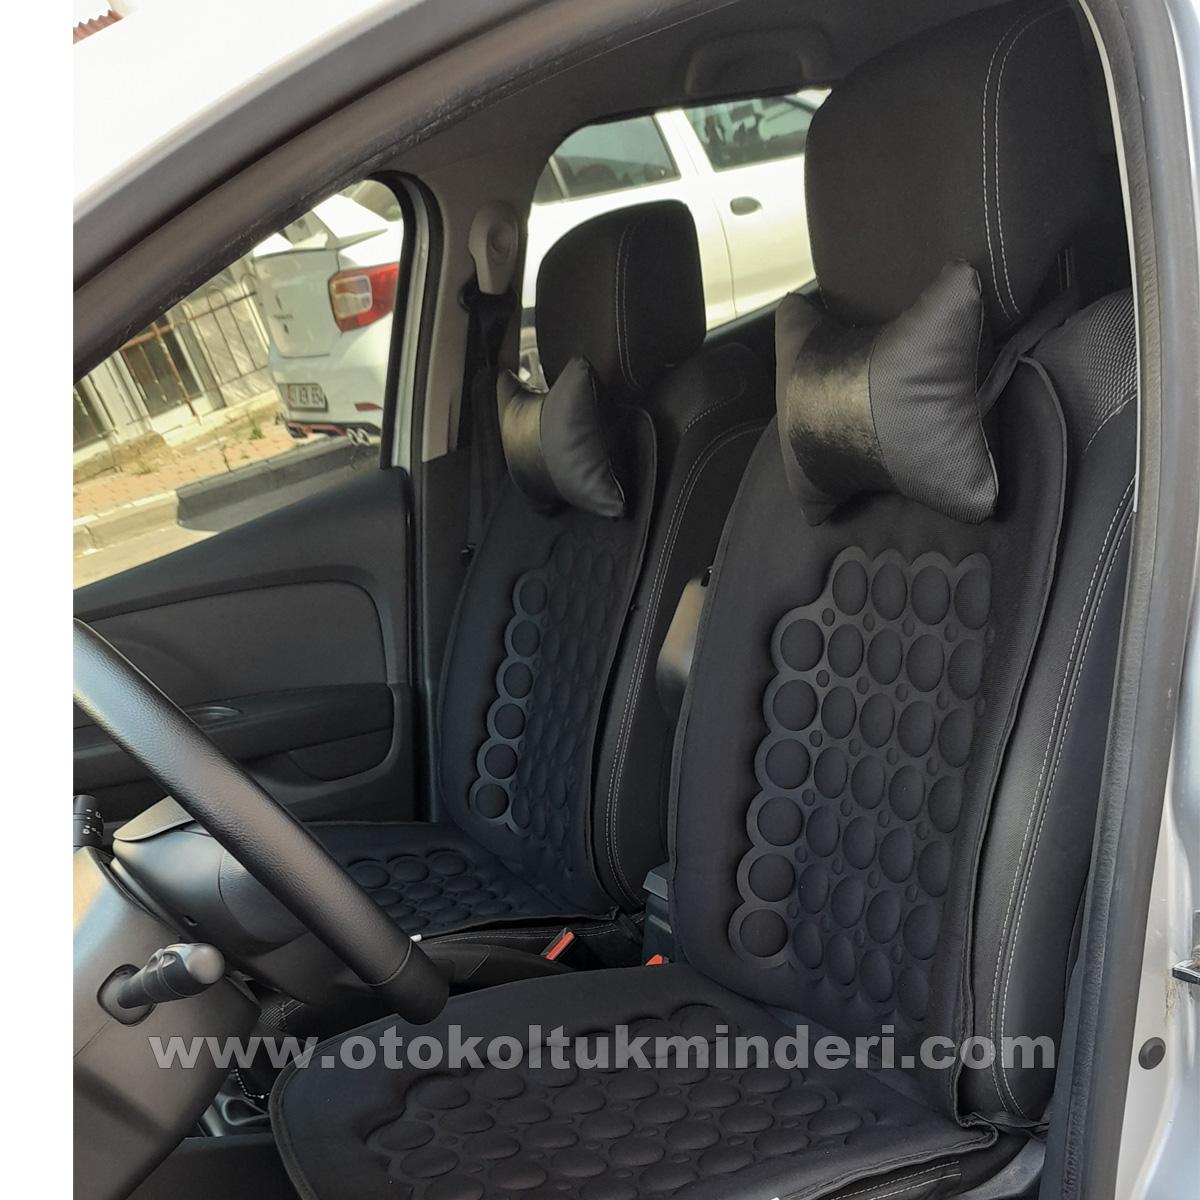 ford koltuk minderi - Ford uyumlu koltuk minderi